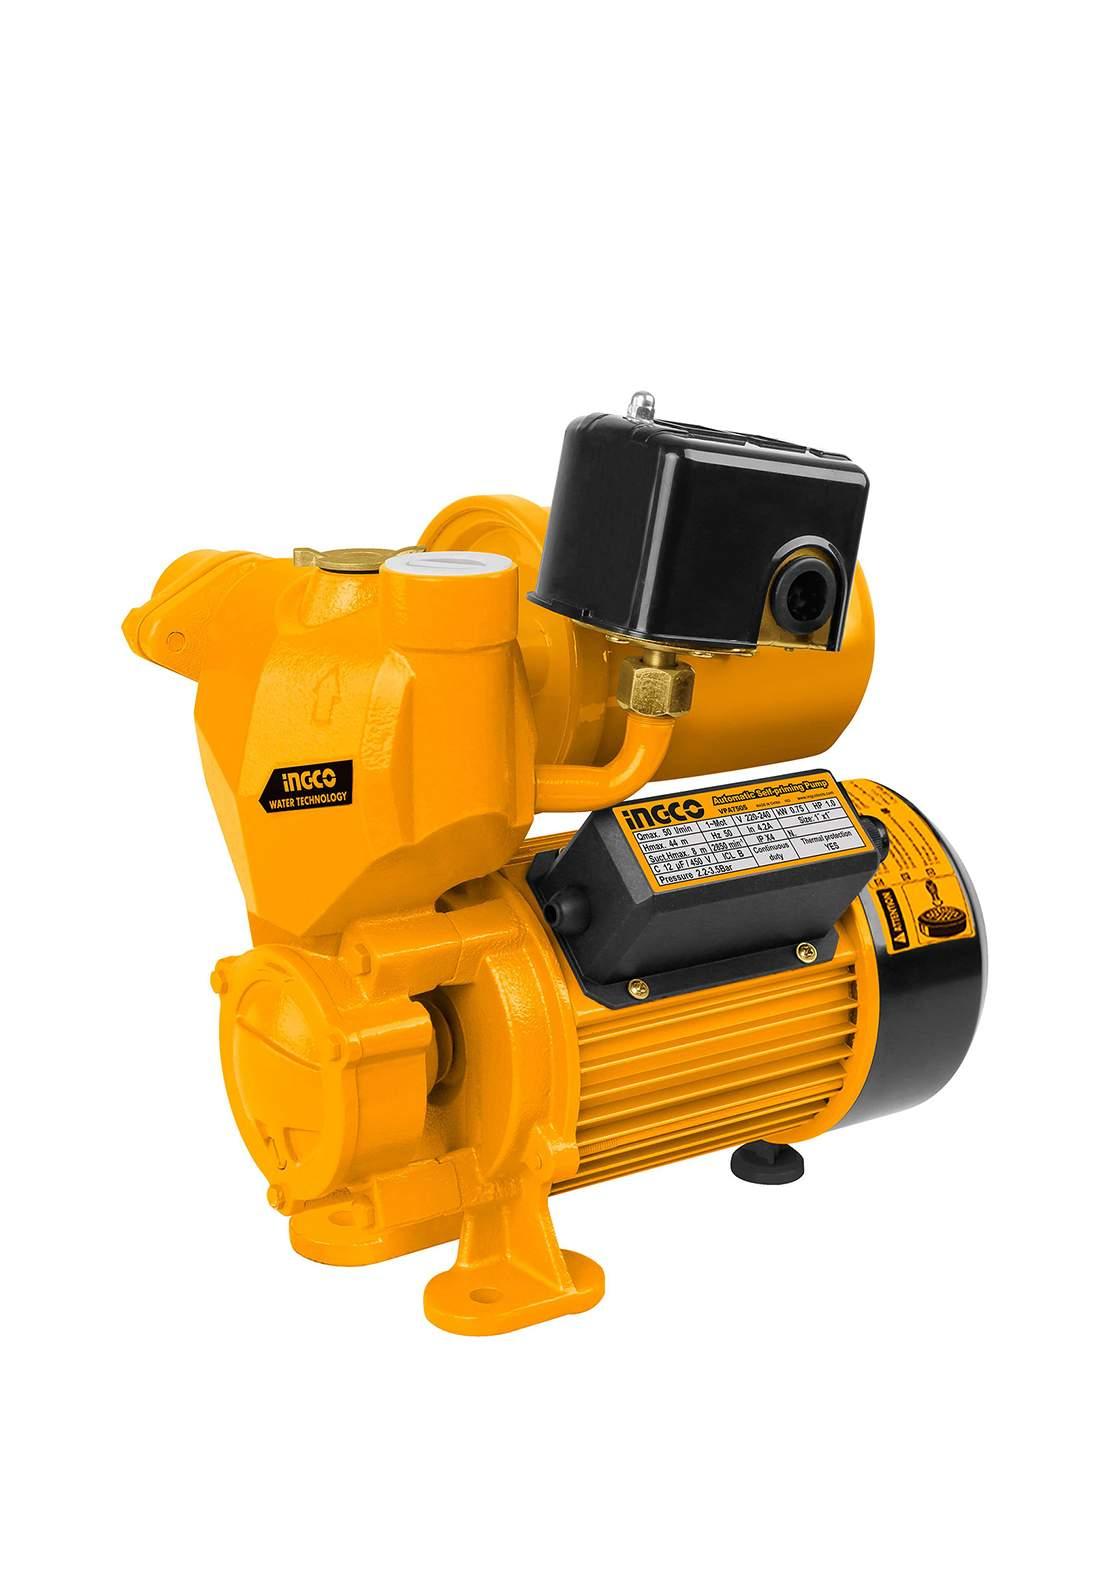 Ingco VPA7505 Water Pump  ماطور بوستر 1 حصان